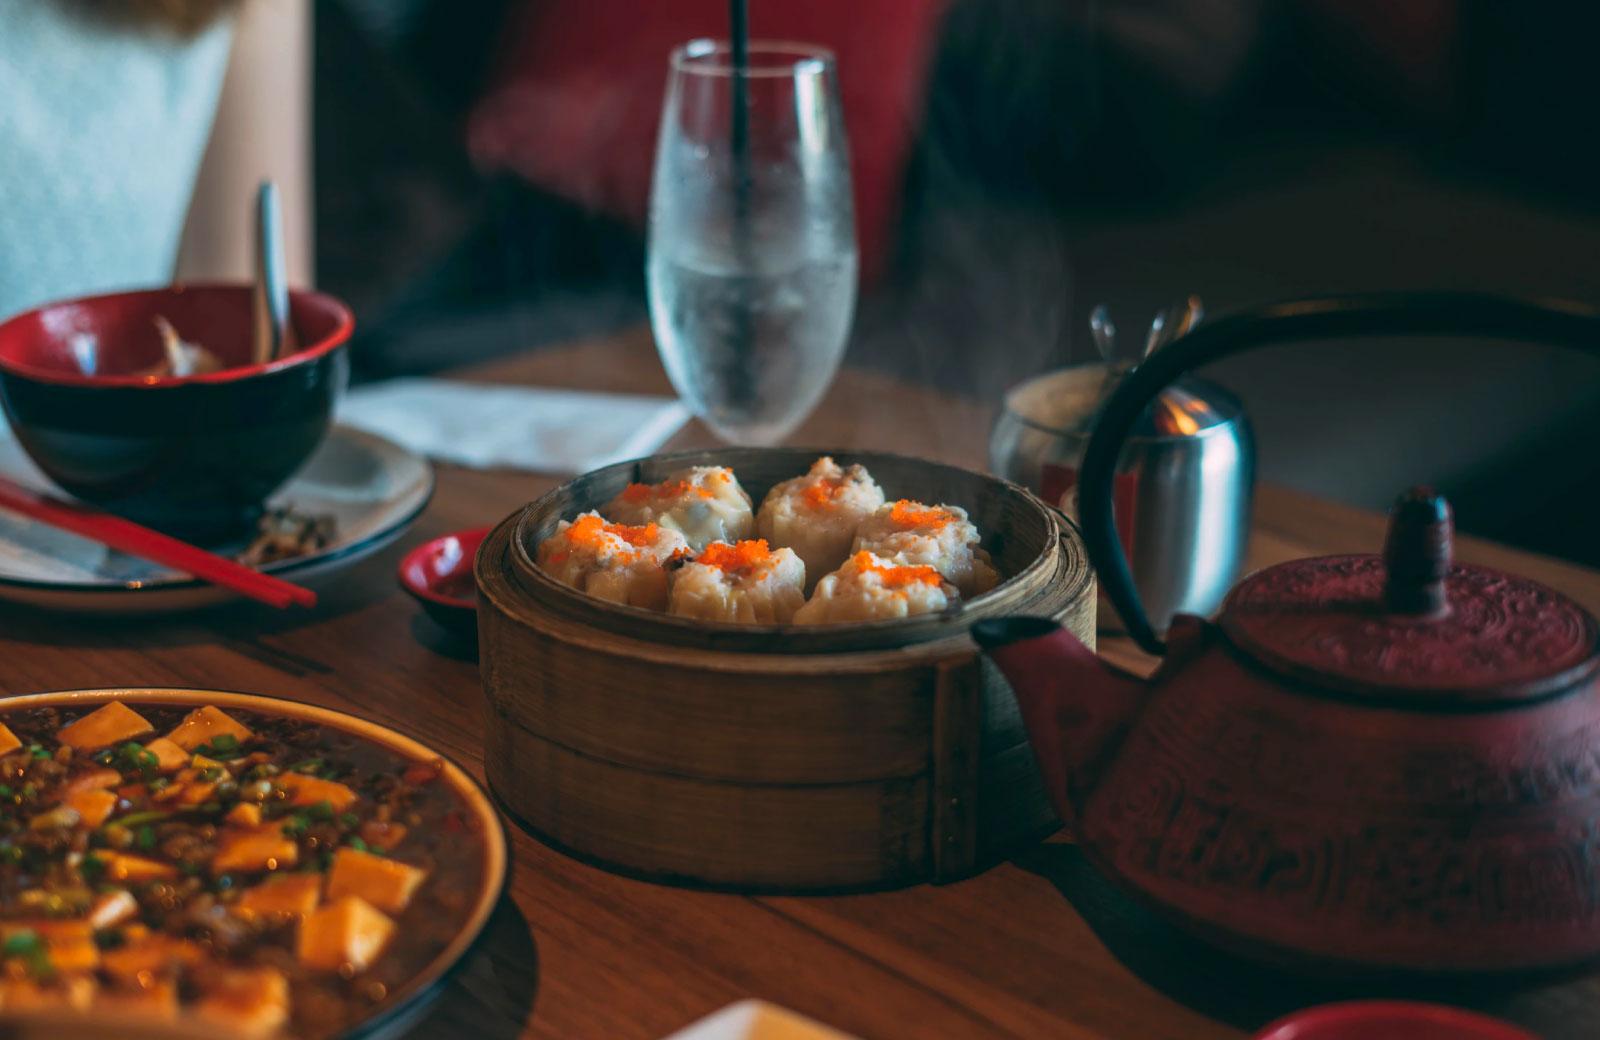 dimsum and oriental food